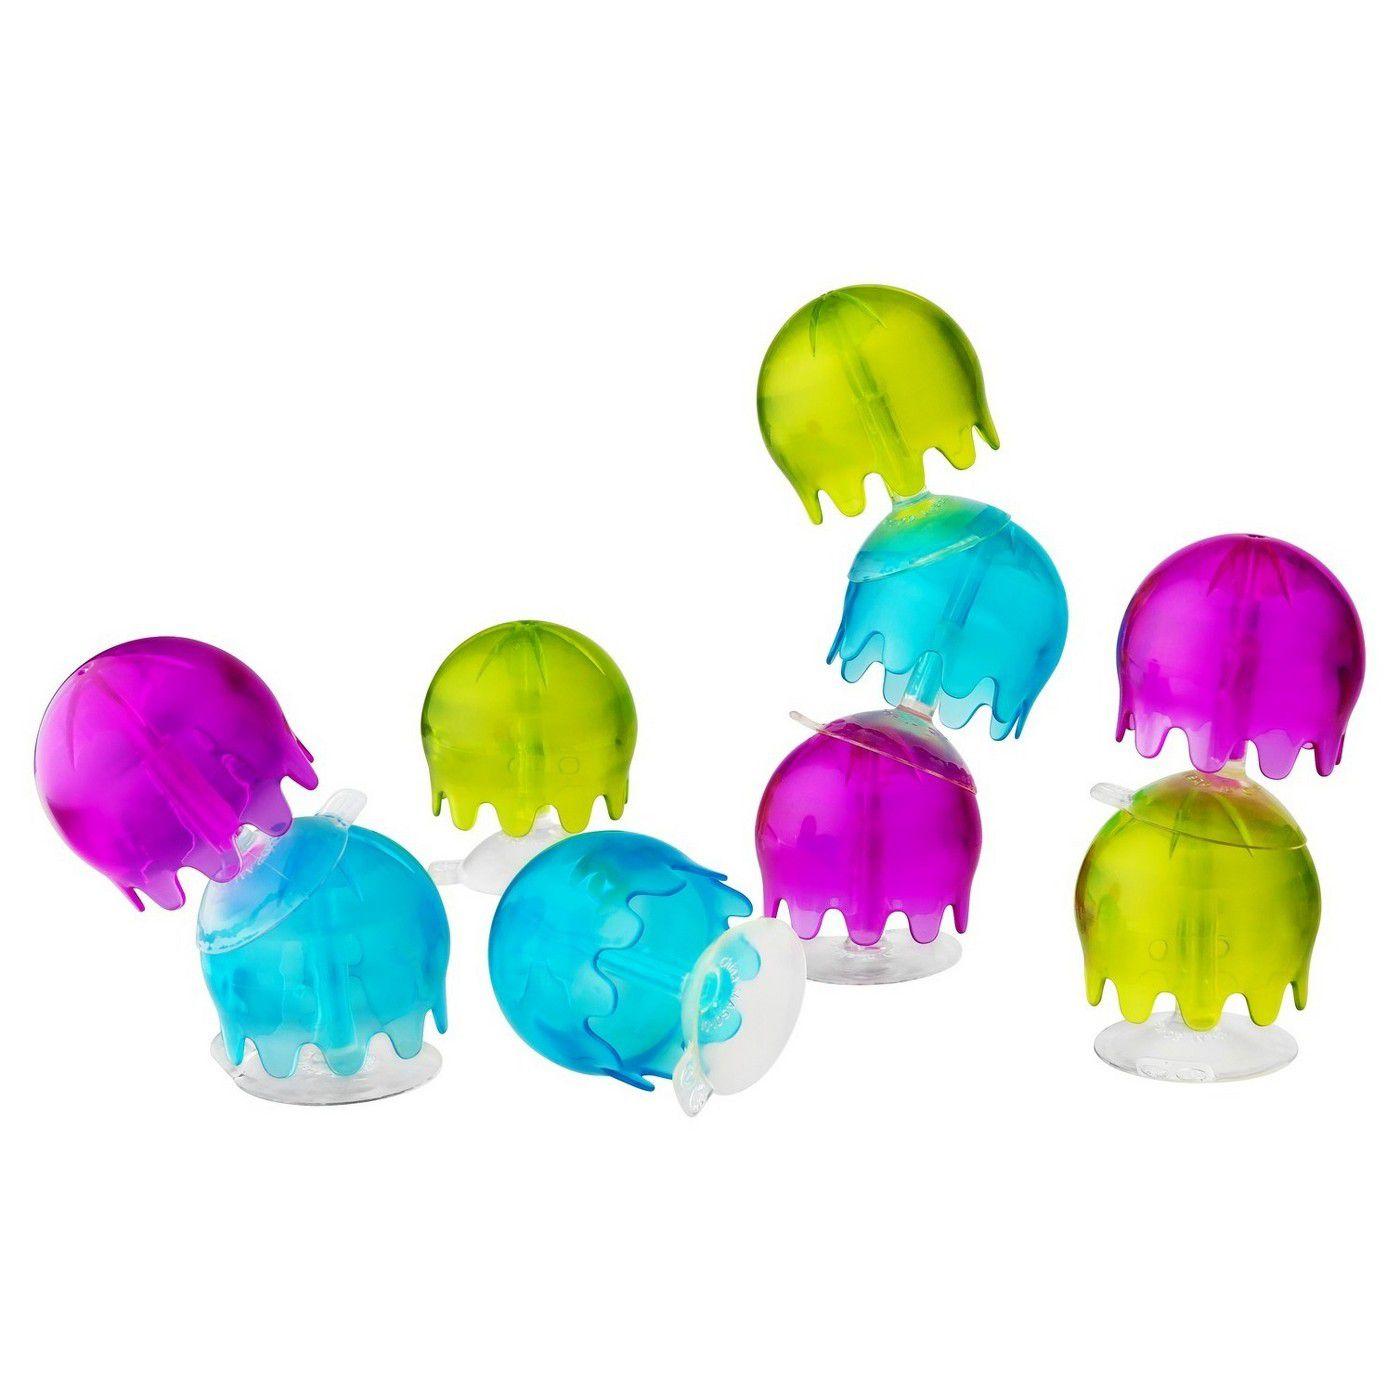 Boon Jellies Suction Bath Toy